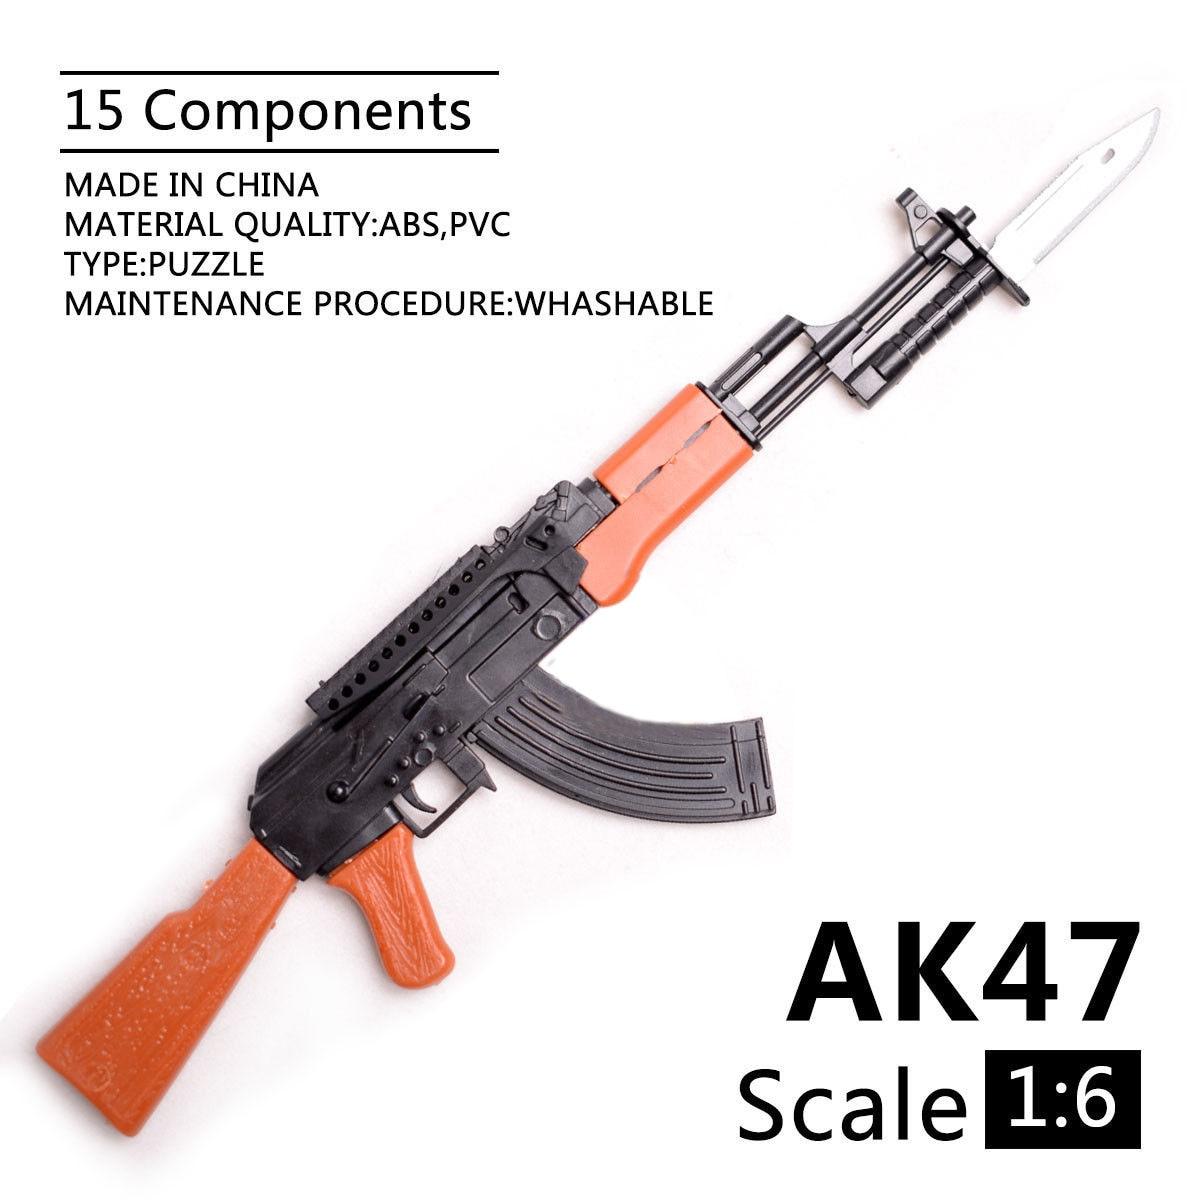 1/6 Scale AK47 Rifle Toy Gun Model Assembled Puzzles Building Bricks Gun Soldier Weapon For Action Figures